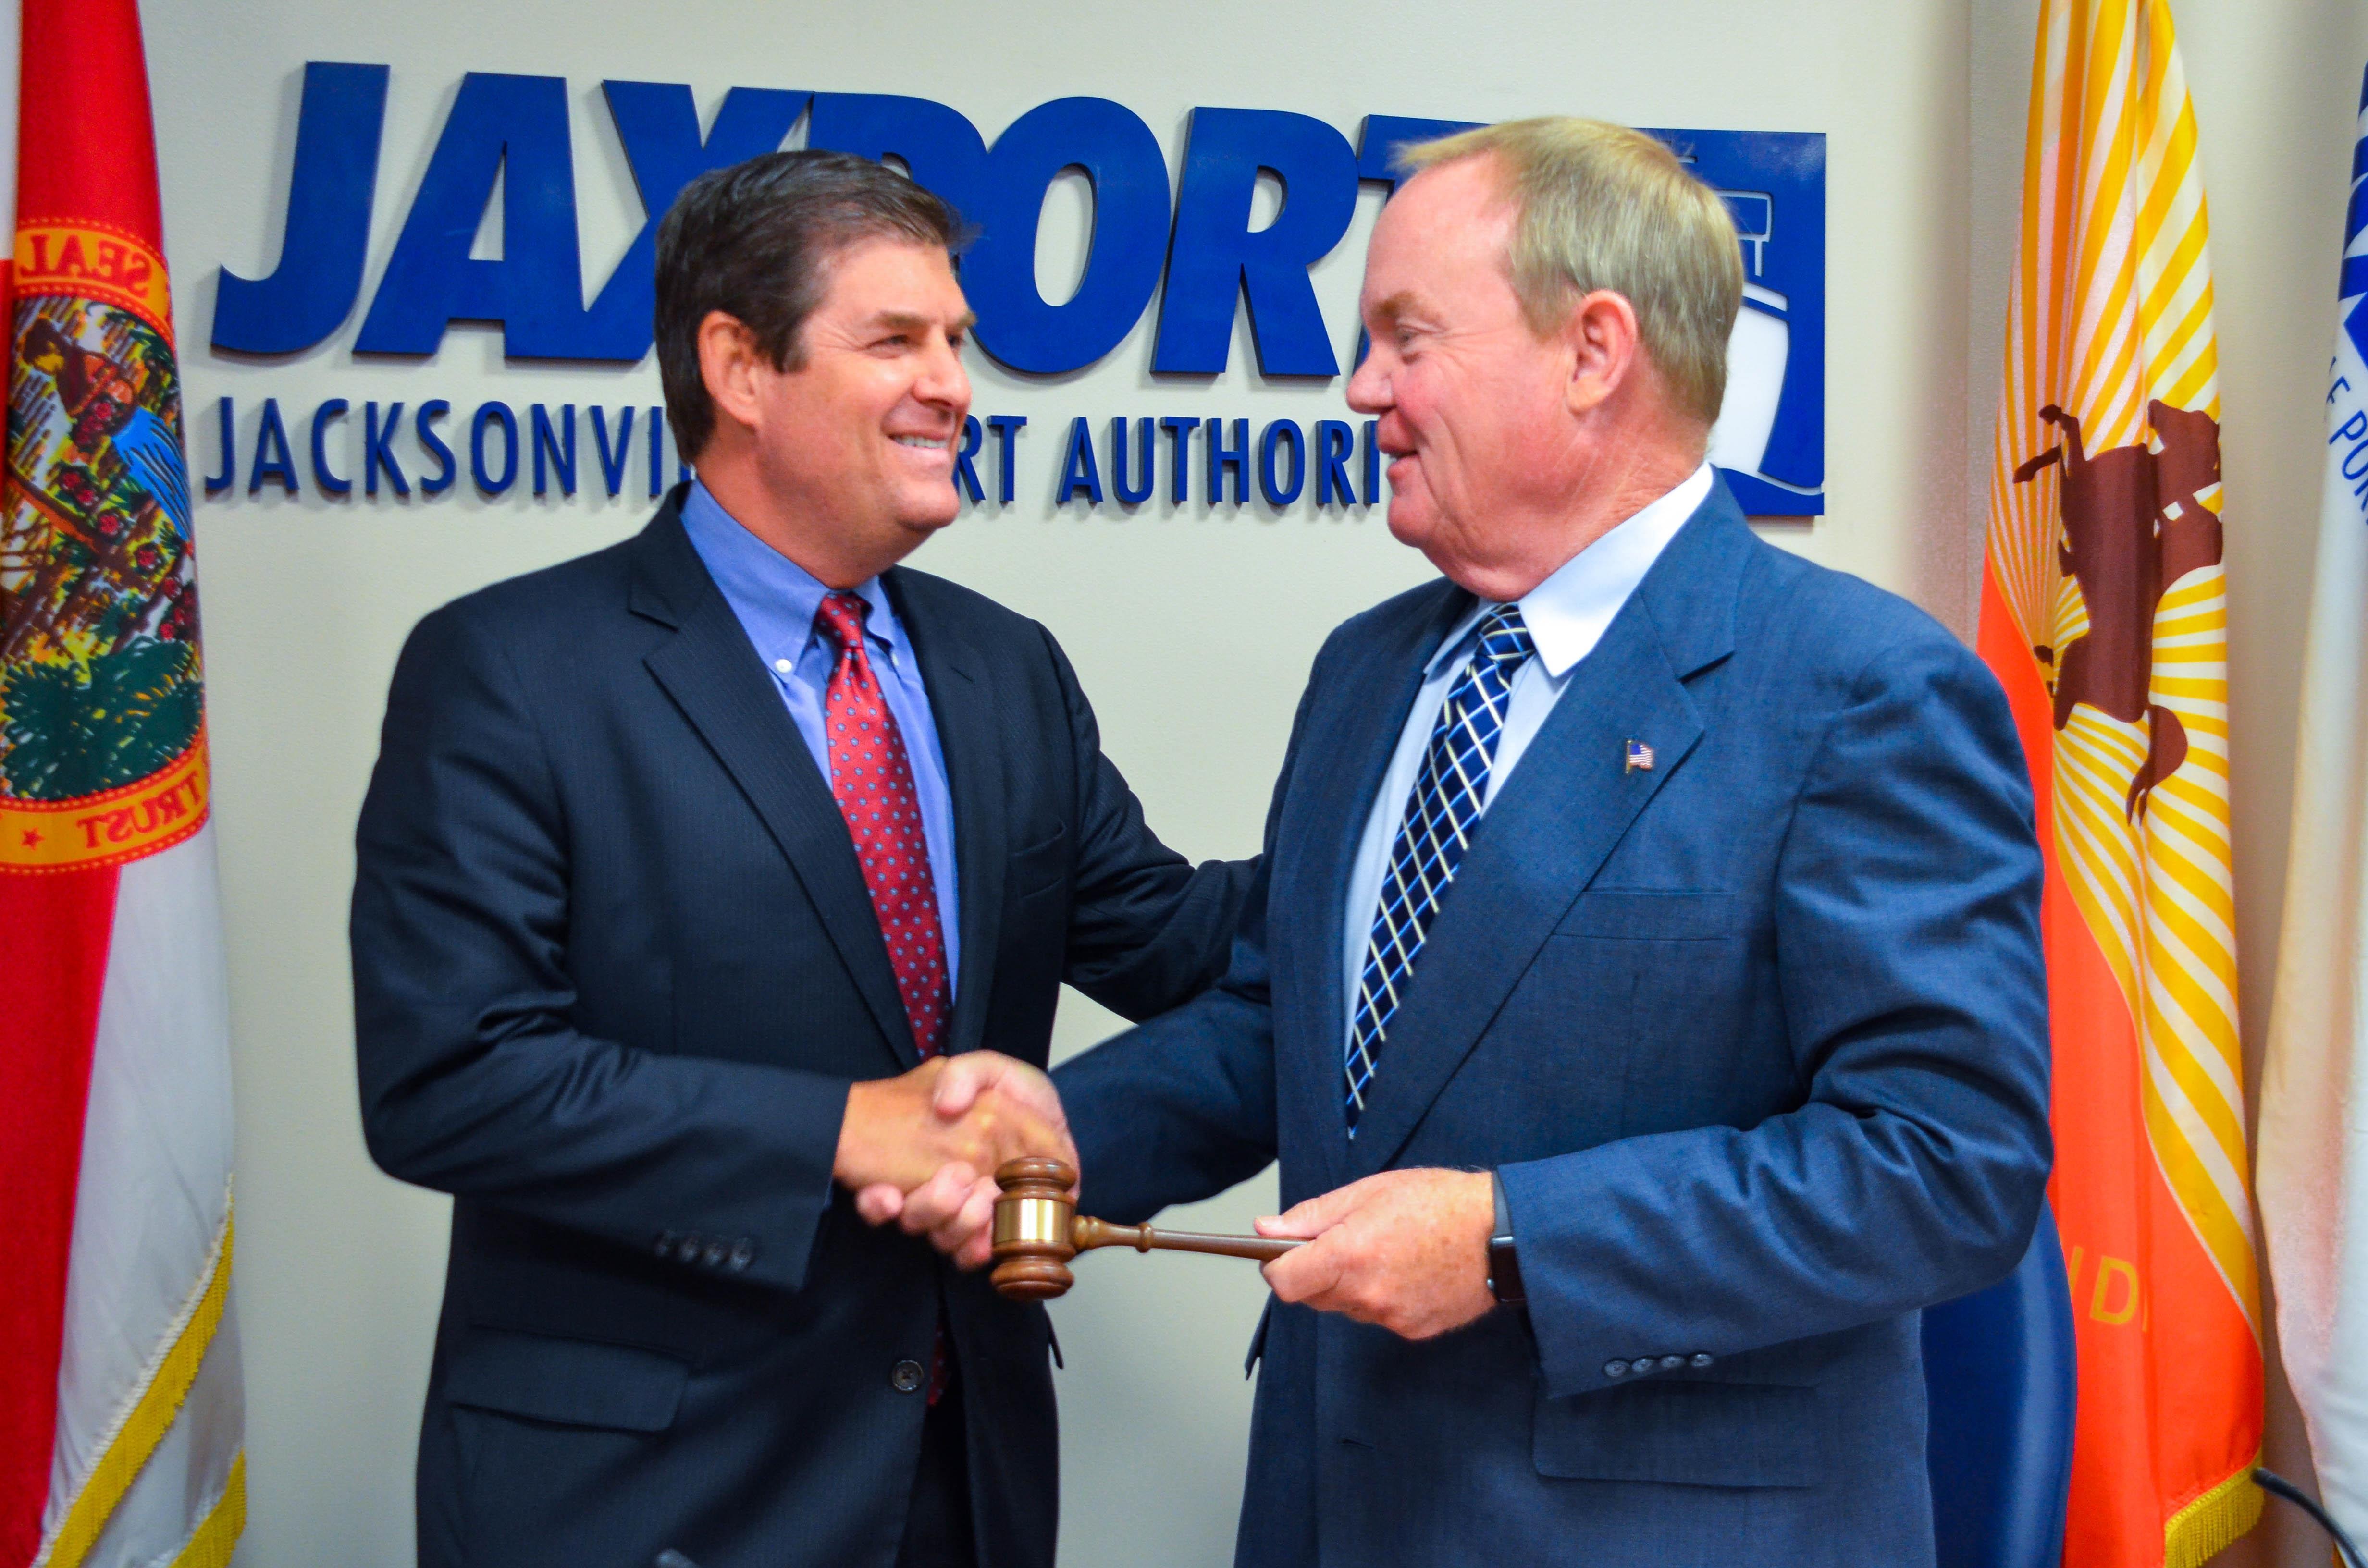 JAXPORT Immediate Past Board Chairman Ed Fleming (right) passes the gavel to incoming Chairman John Falconetti